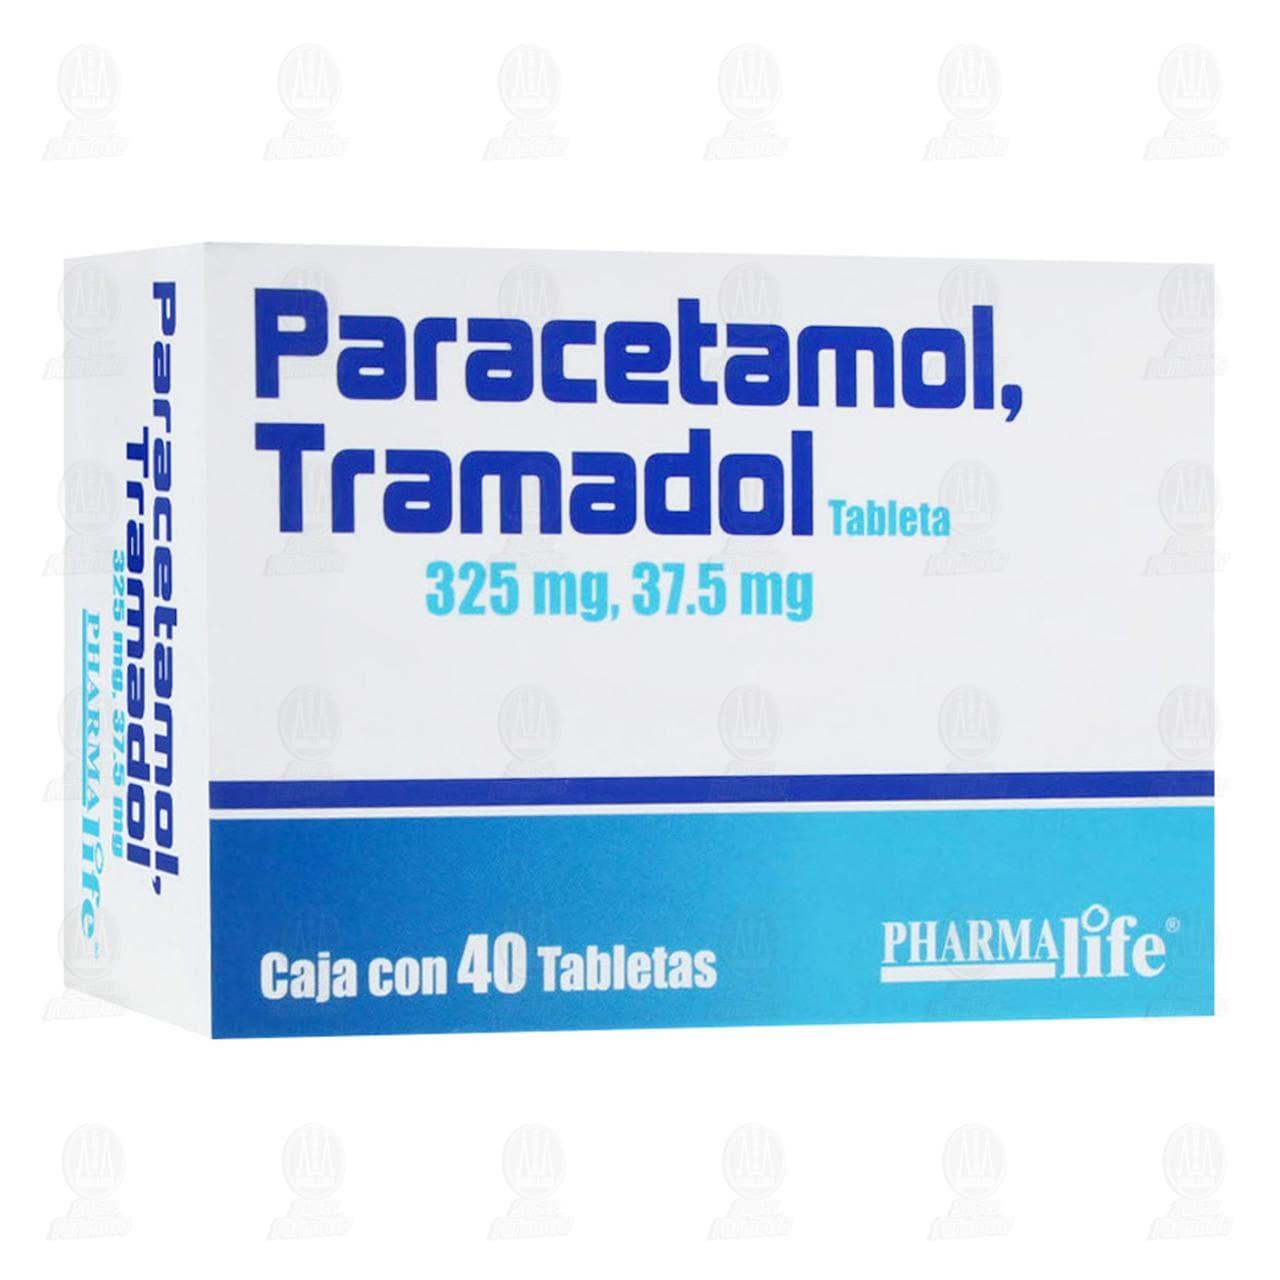 Comprar Paracetamol/Tramadol 325mg/37.5mg 40 Tabletas Pharmalife en Farmacias Guadalajara